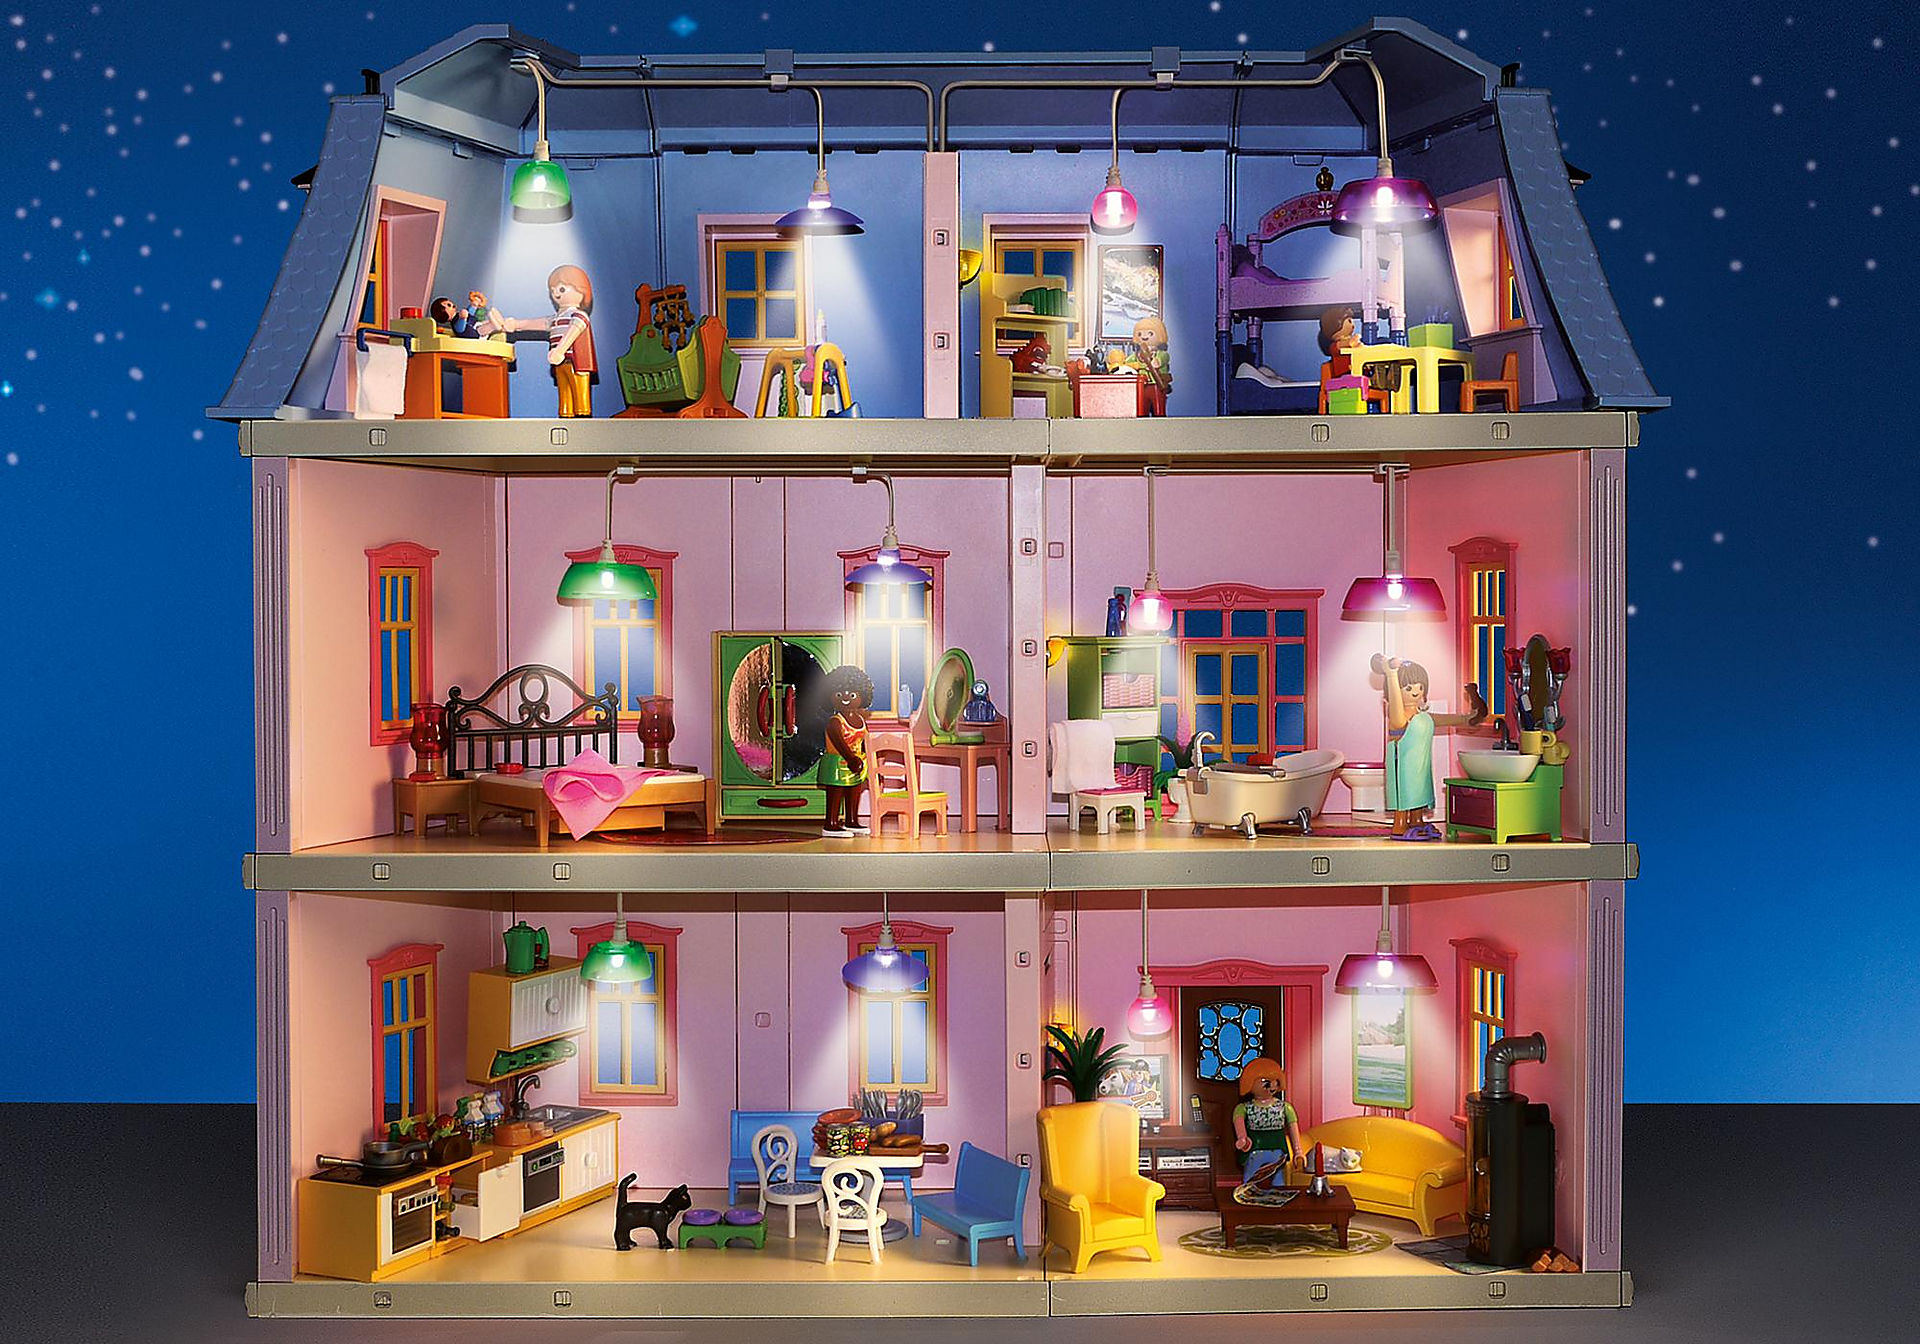 http://media.playmobil.com/i/playmobil/6456_product_extra1/Set de Iluminación para la Casa de Muñecas Romántica (ref. 5303)